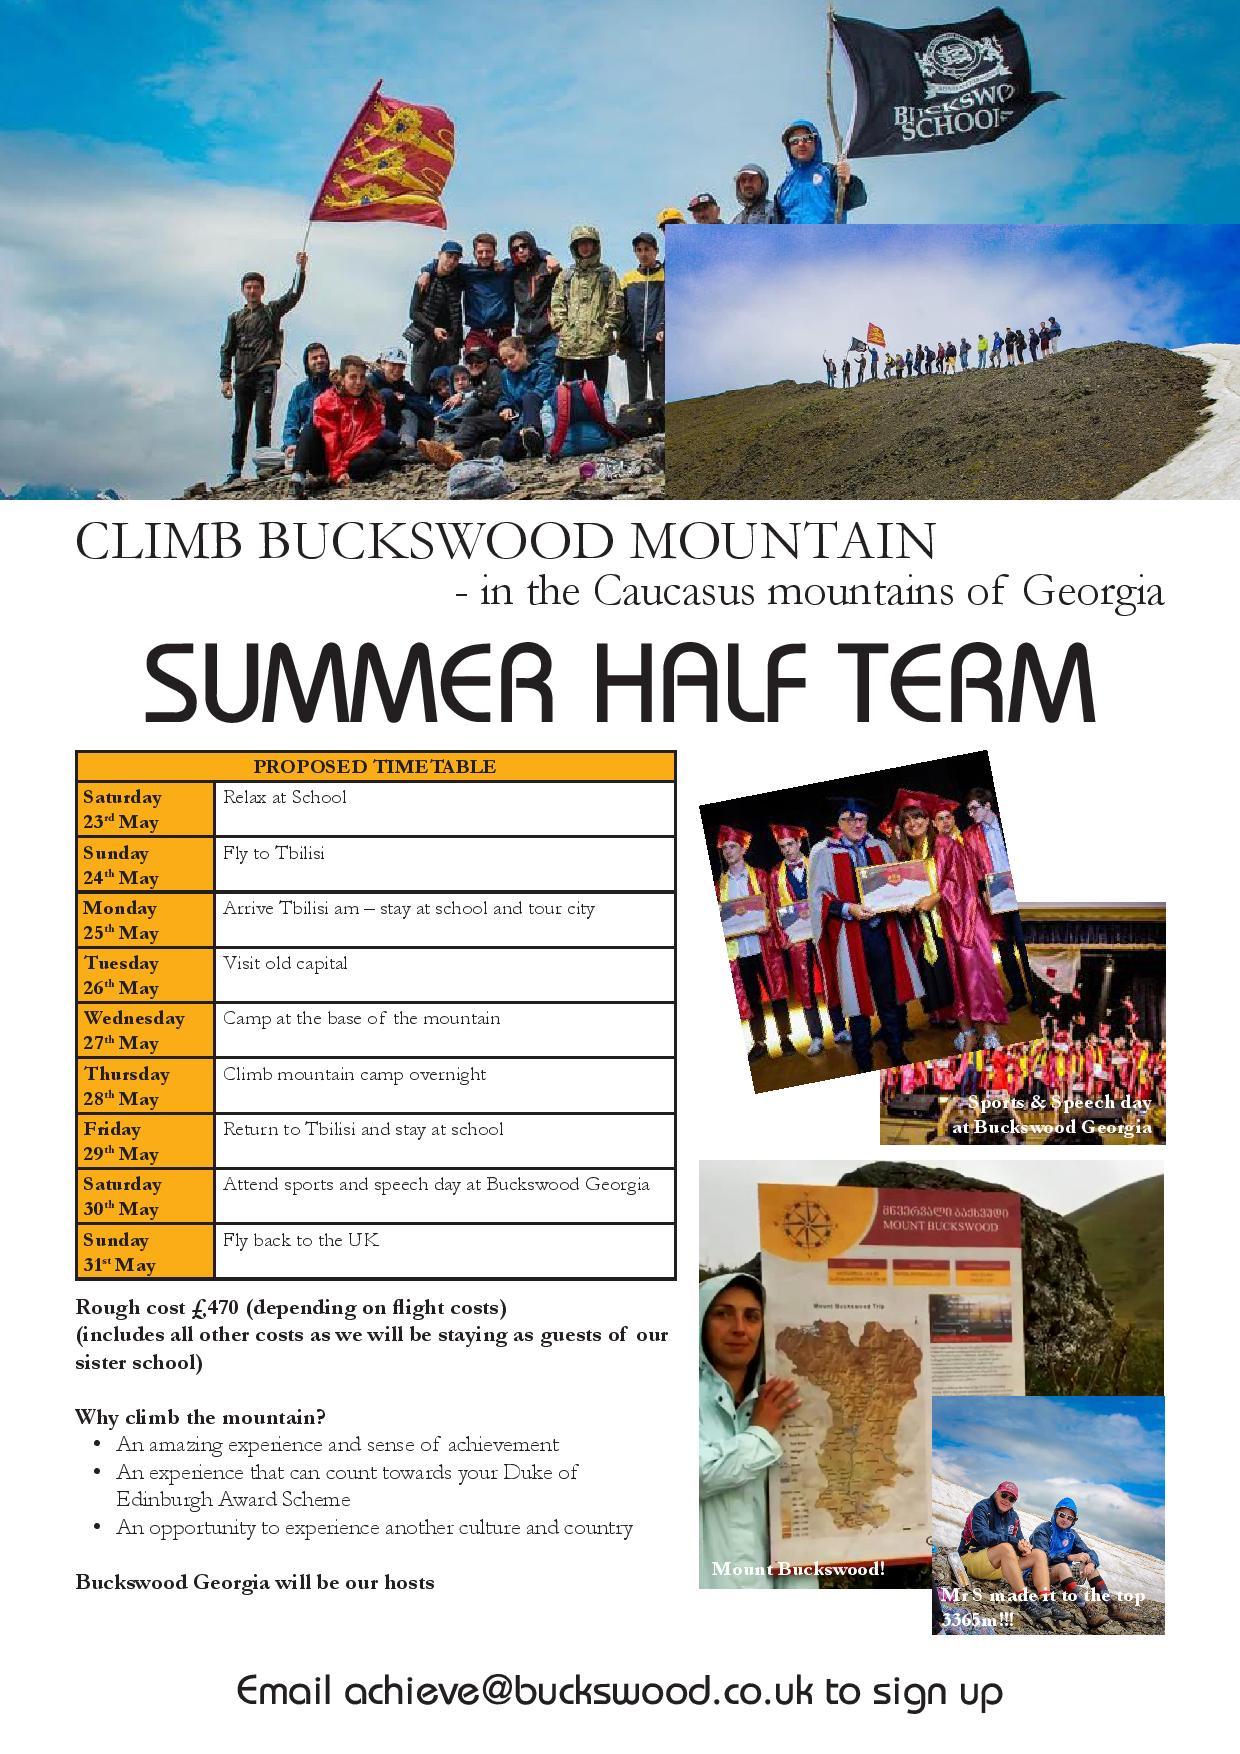 Climb Mount Buckswood